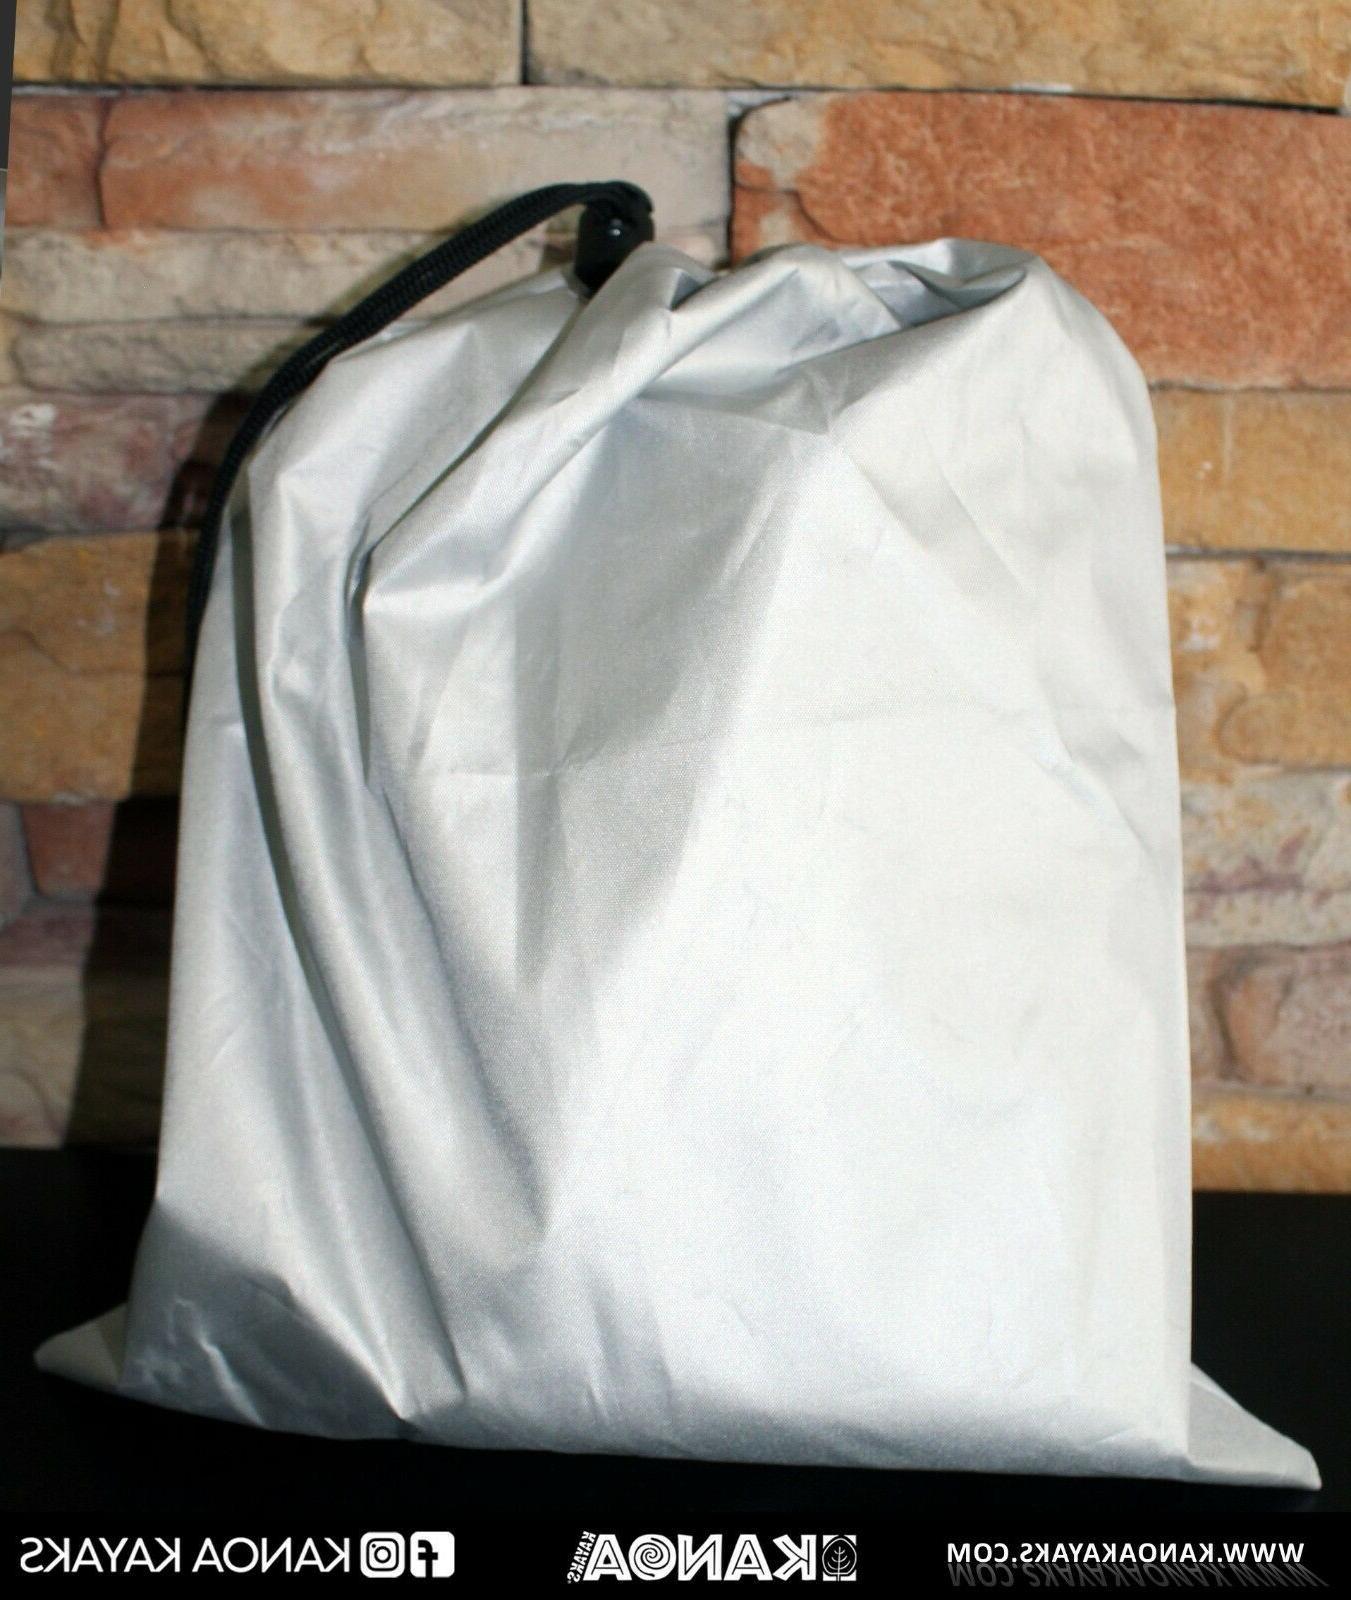 10'-11' KANOA waterproof dust protector